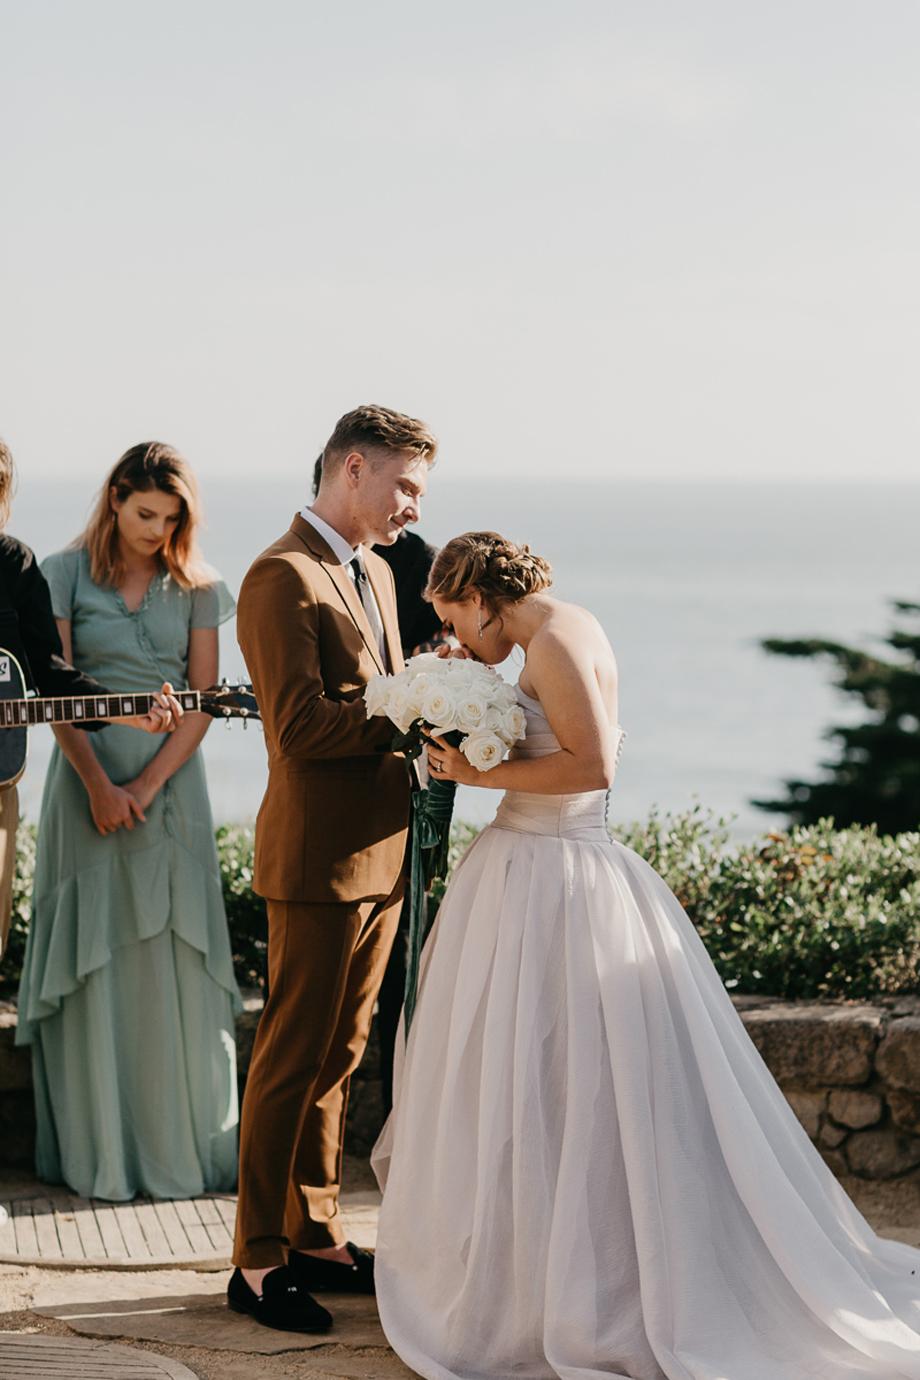 816-destination-wedding-photographer-san-francisco-california--the-livelys.jpg